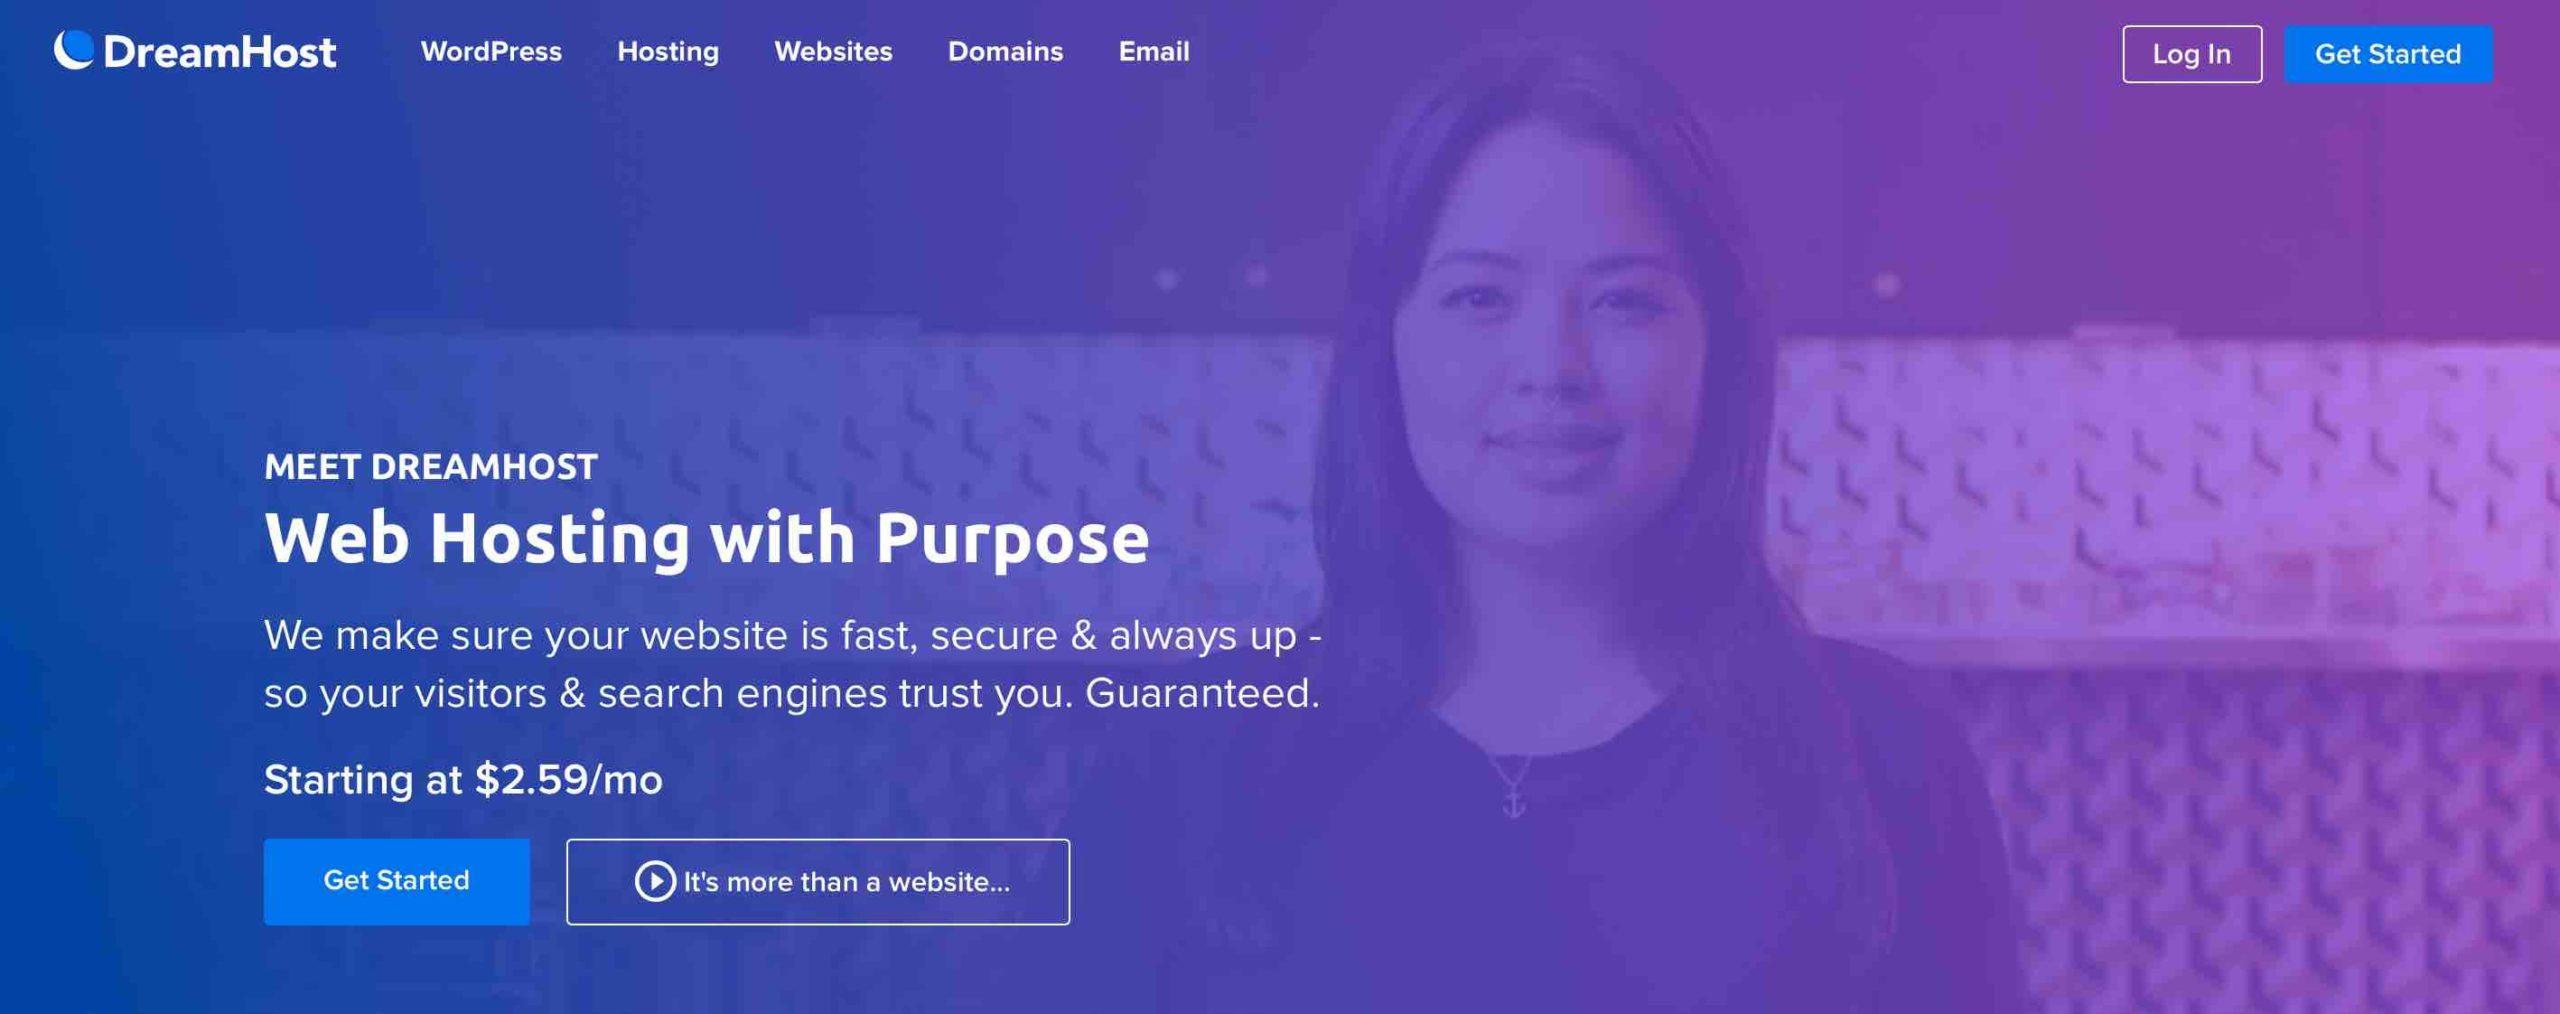 Web Hosting with Purpose